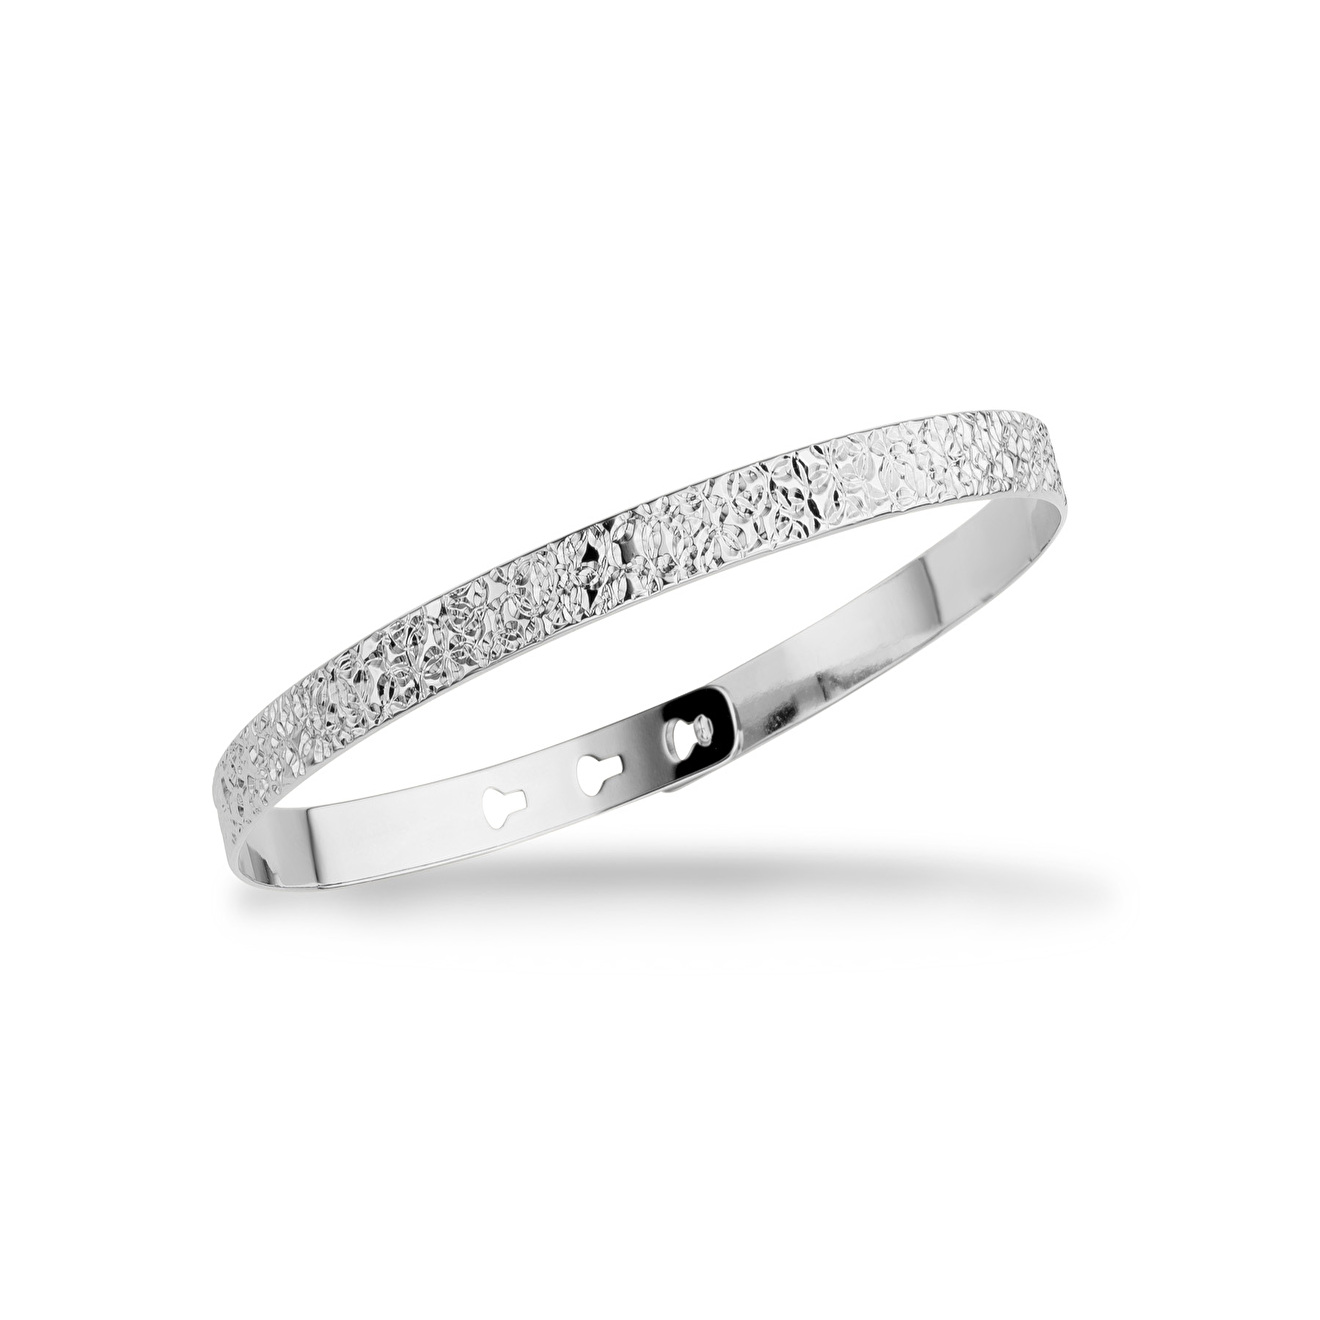 Mya Bay Покрытый серебром браслет Stitched